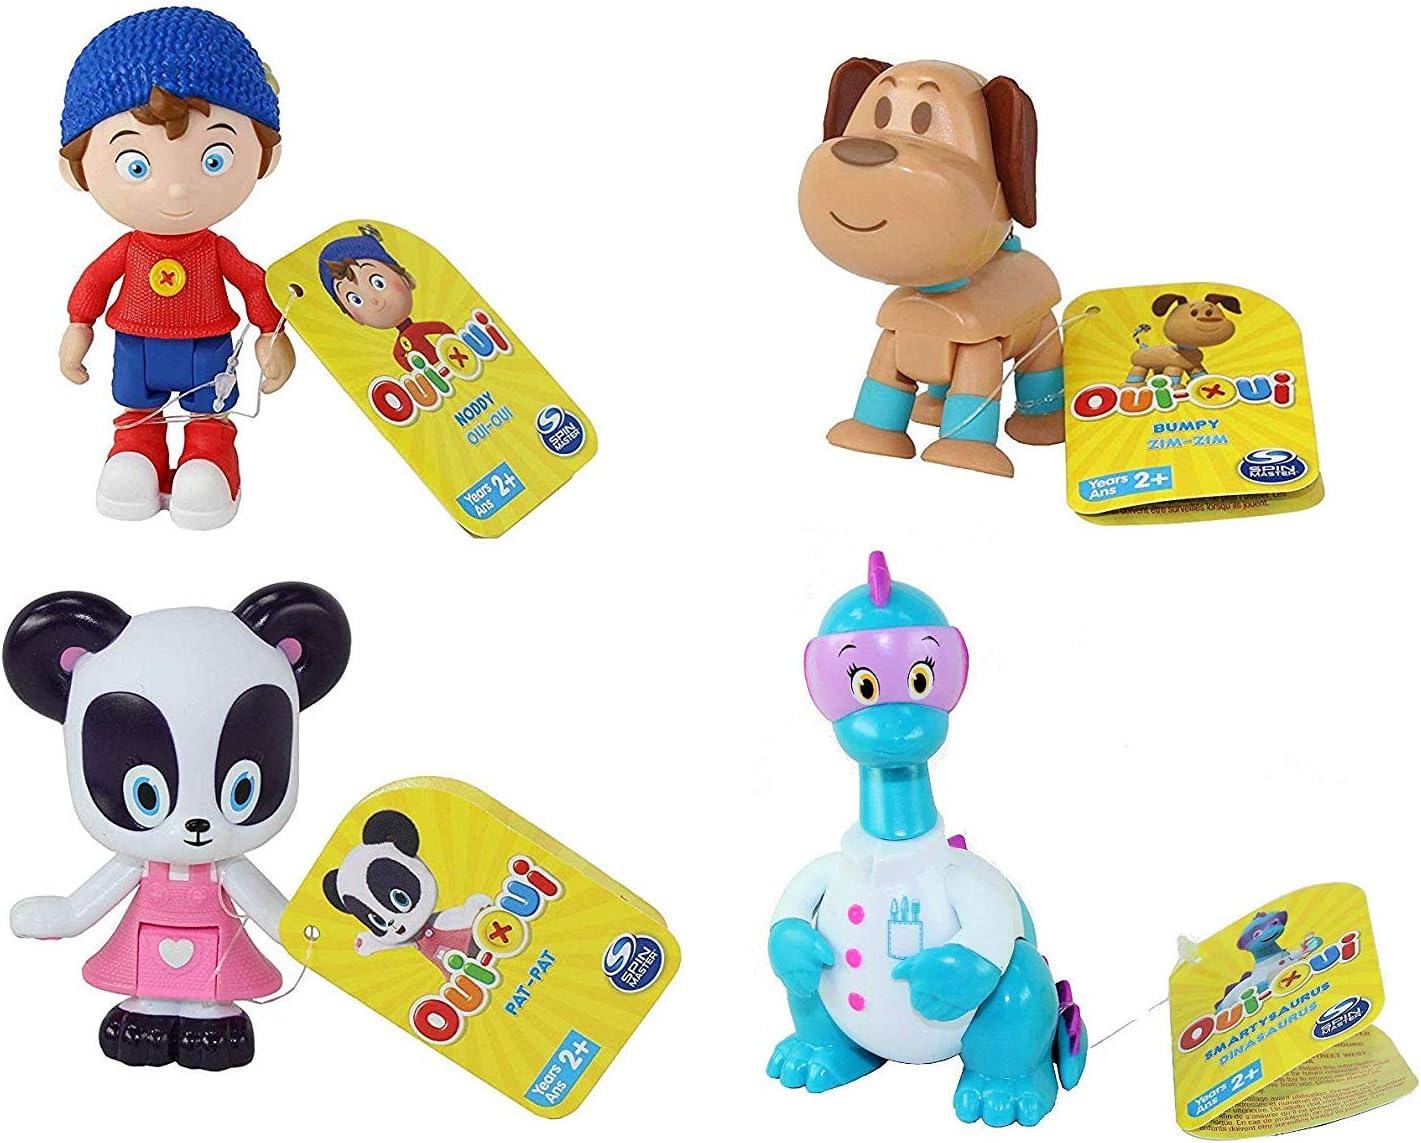 Noddy Dreamworks Toyland Detective 3 Piece Figure Set Bumpy Dog /& Pat-Pat